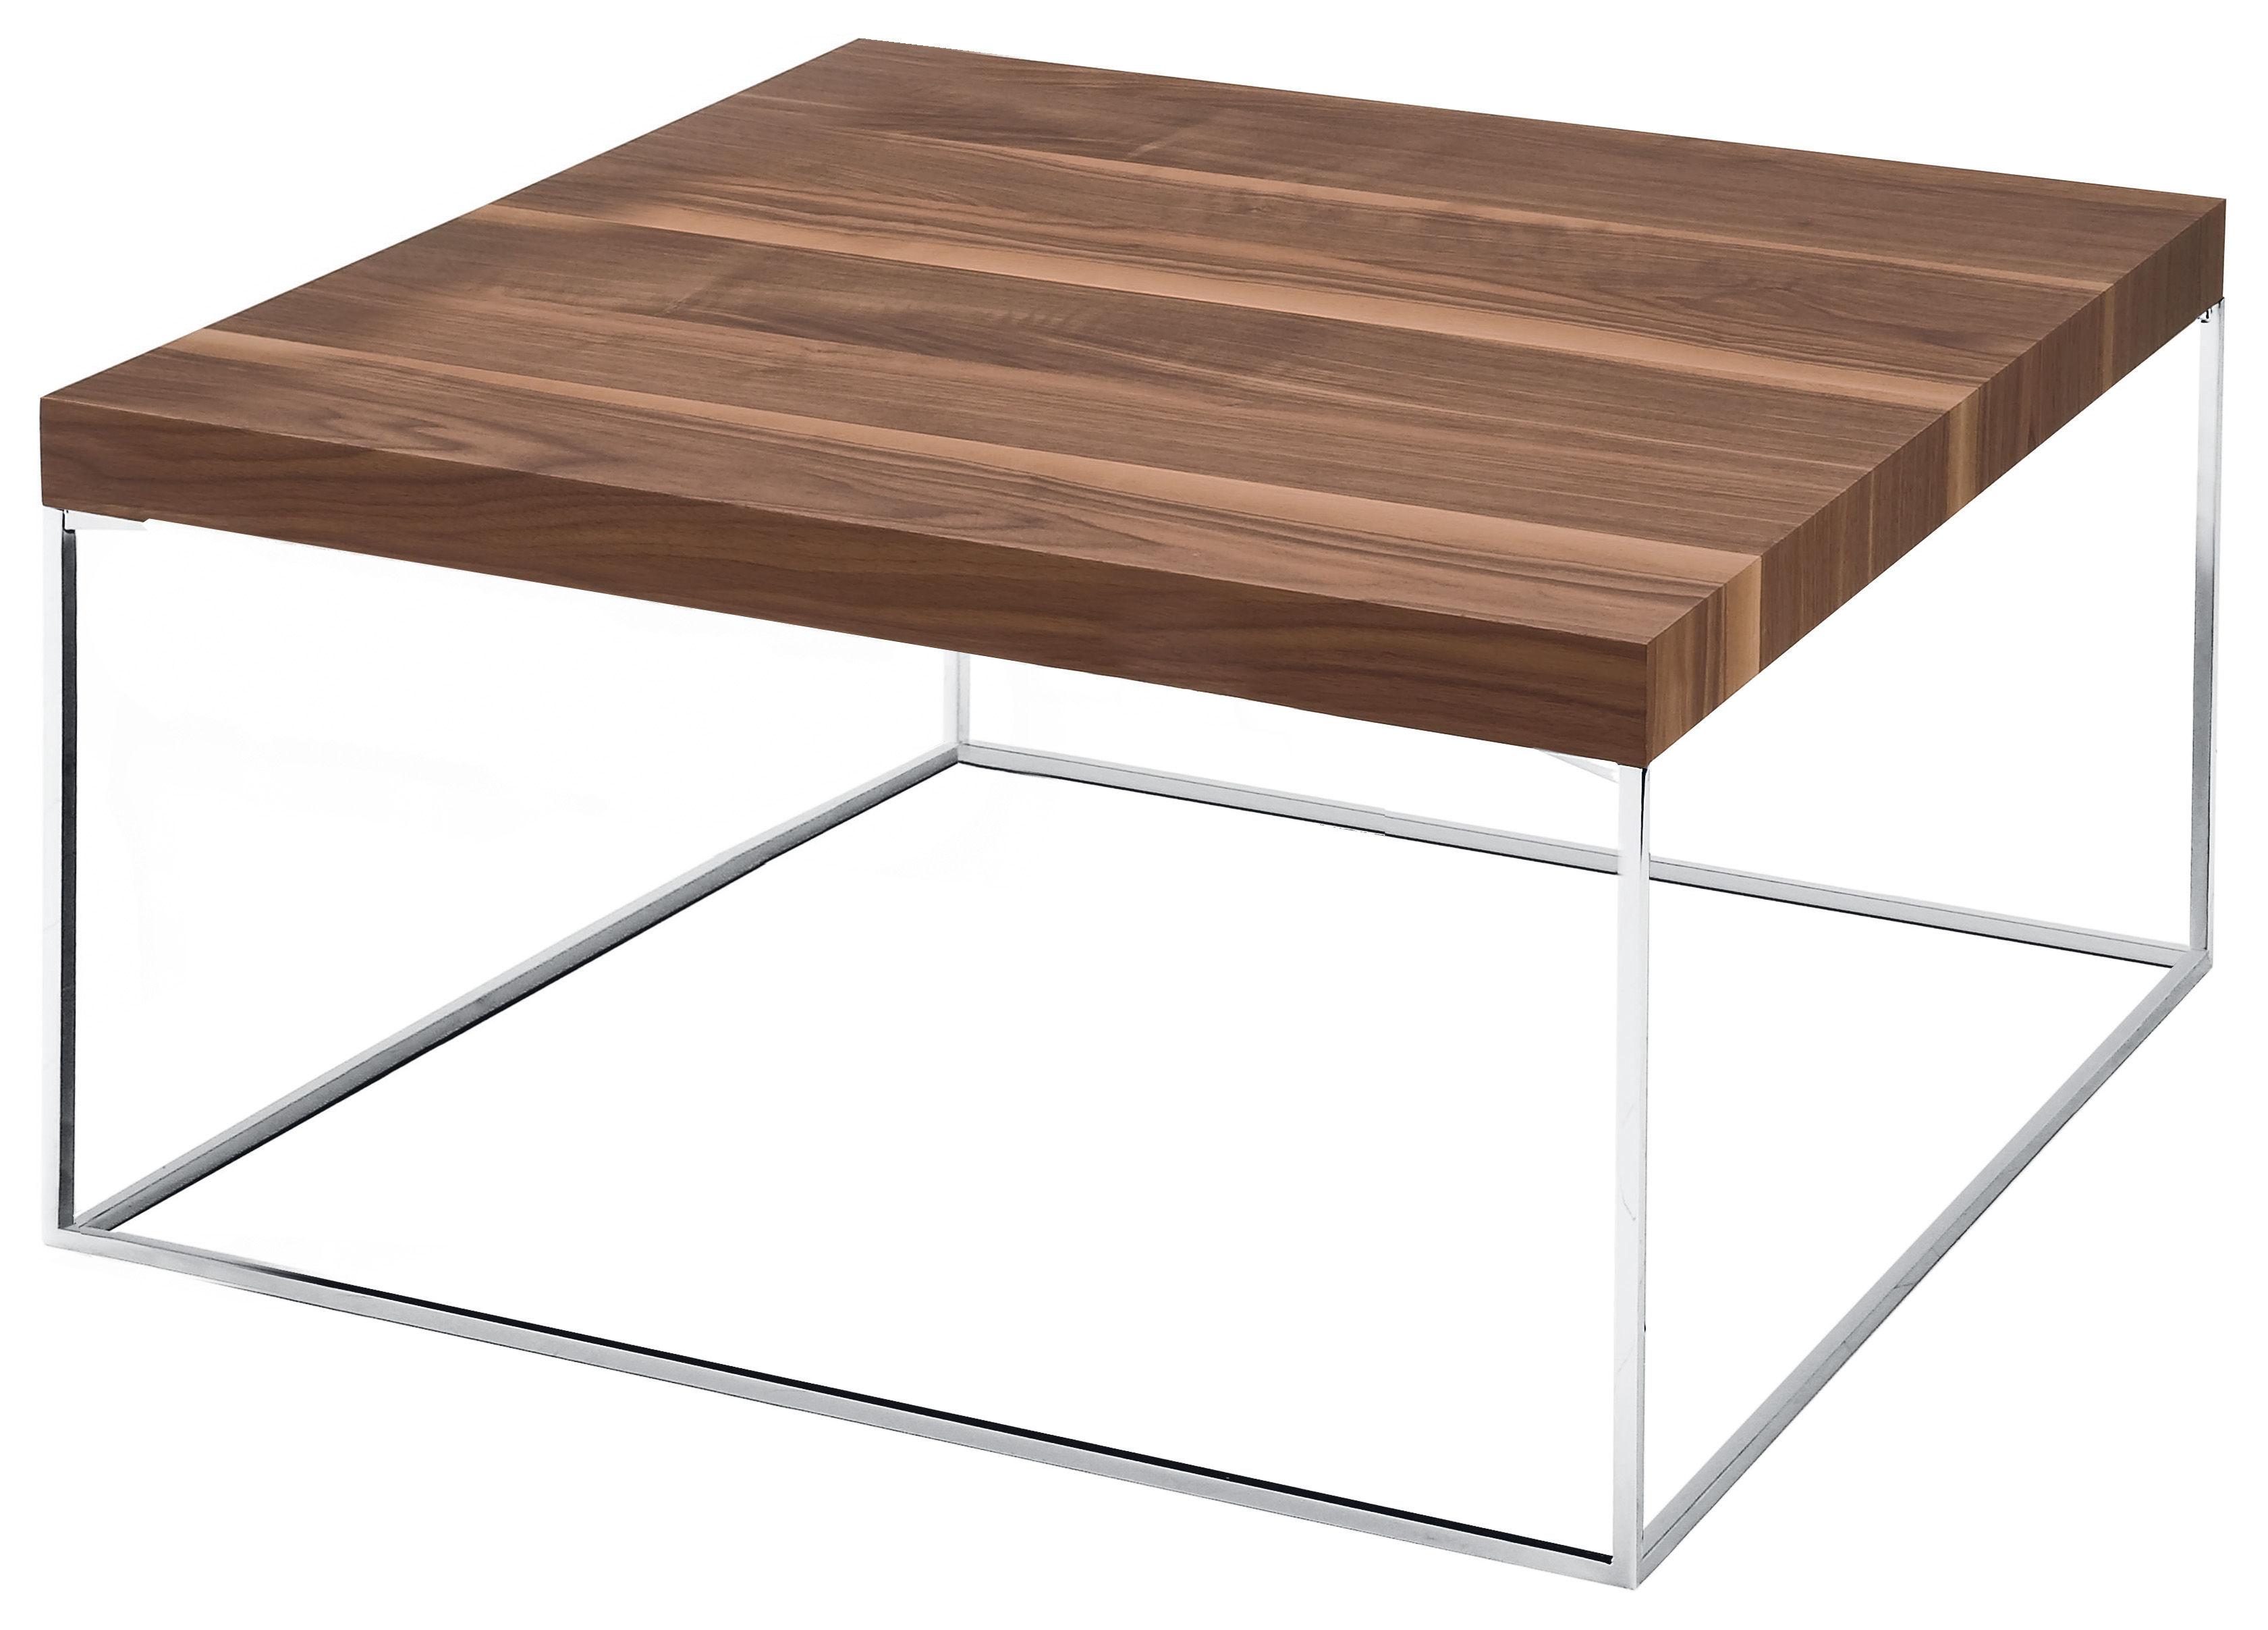 Oliver coffee table walnut walnut canaletto chromium for Coffee table 80cm x 80cm